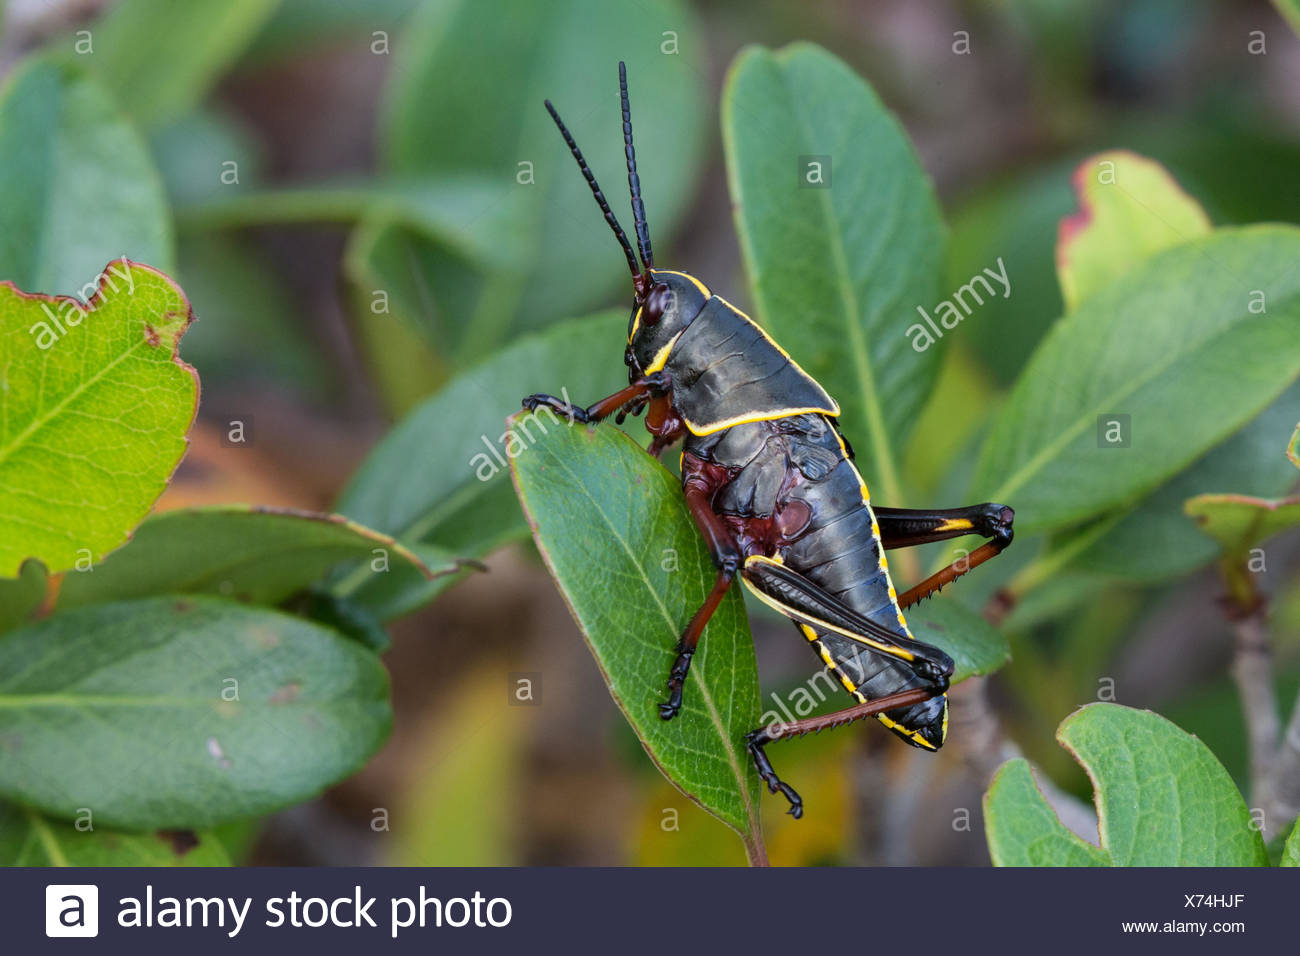 Eastern lubber grasshopper (Romalea microptera), nymph, USA, Florida - Stock Image